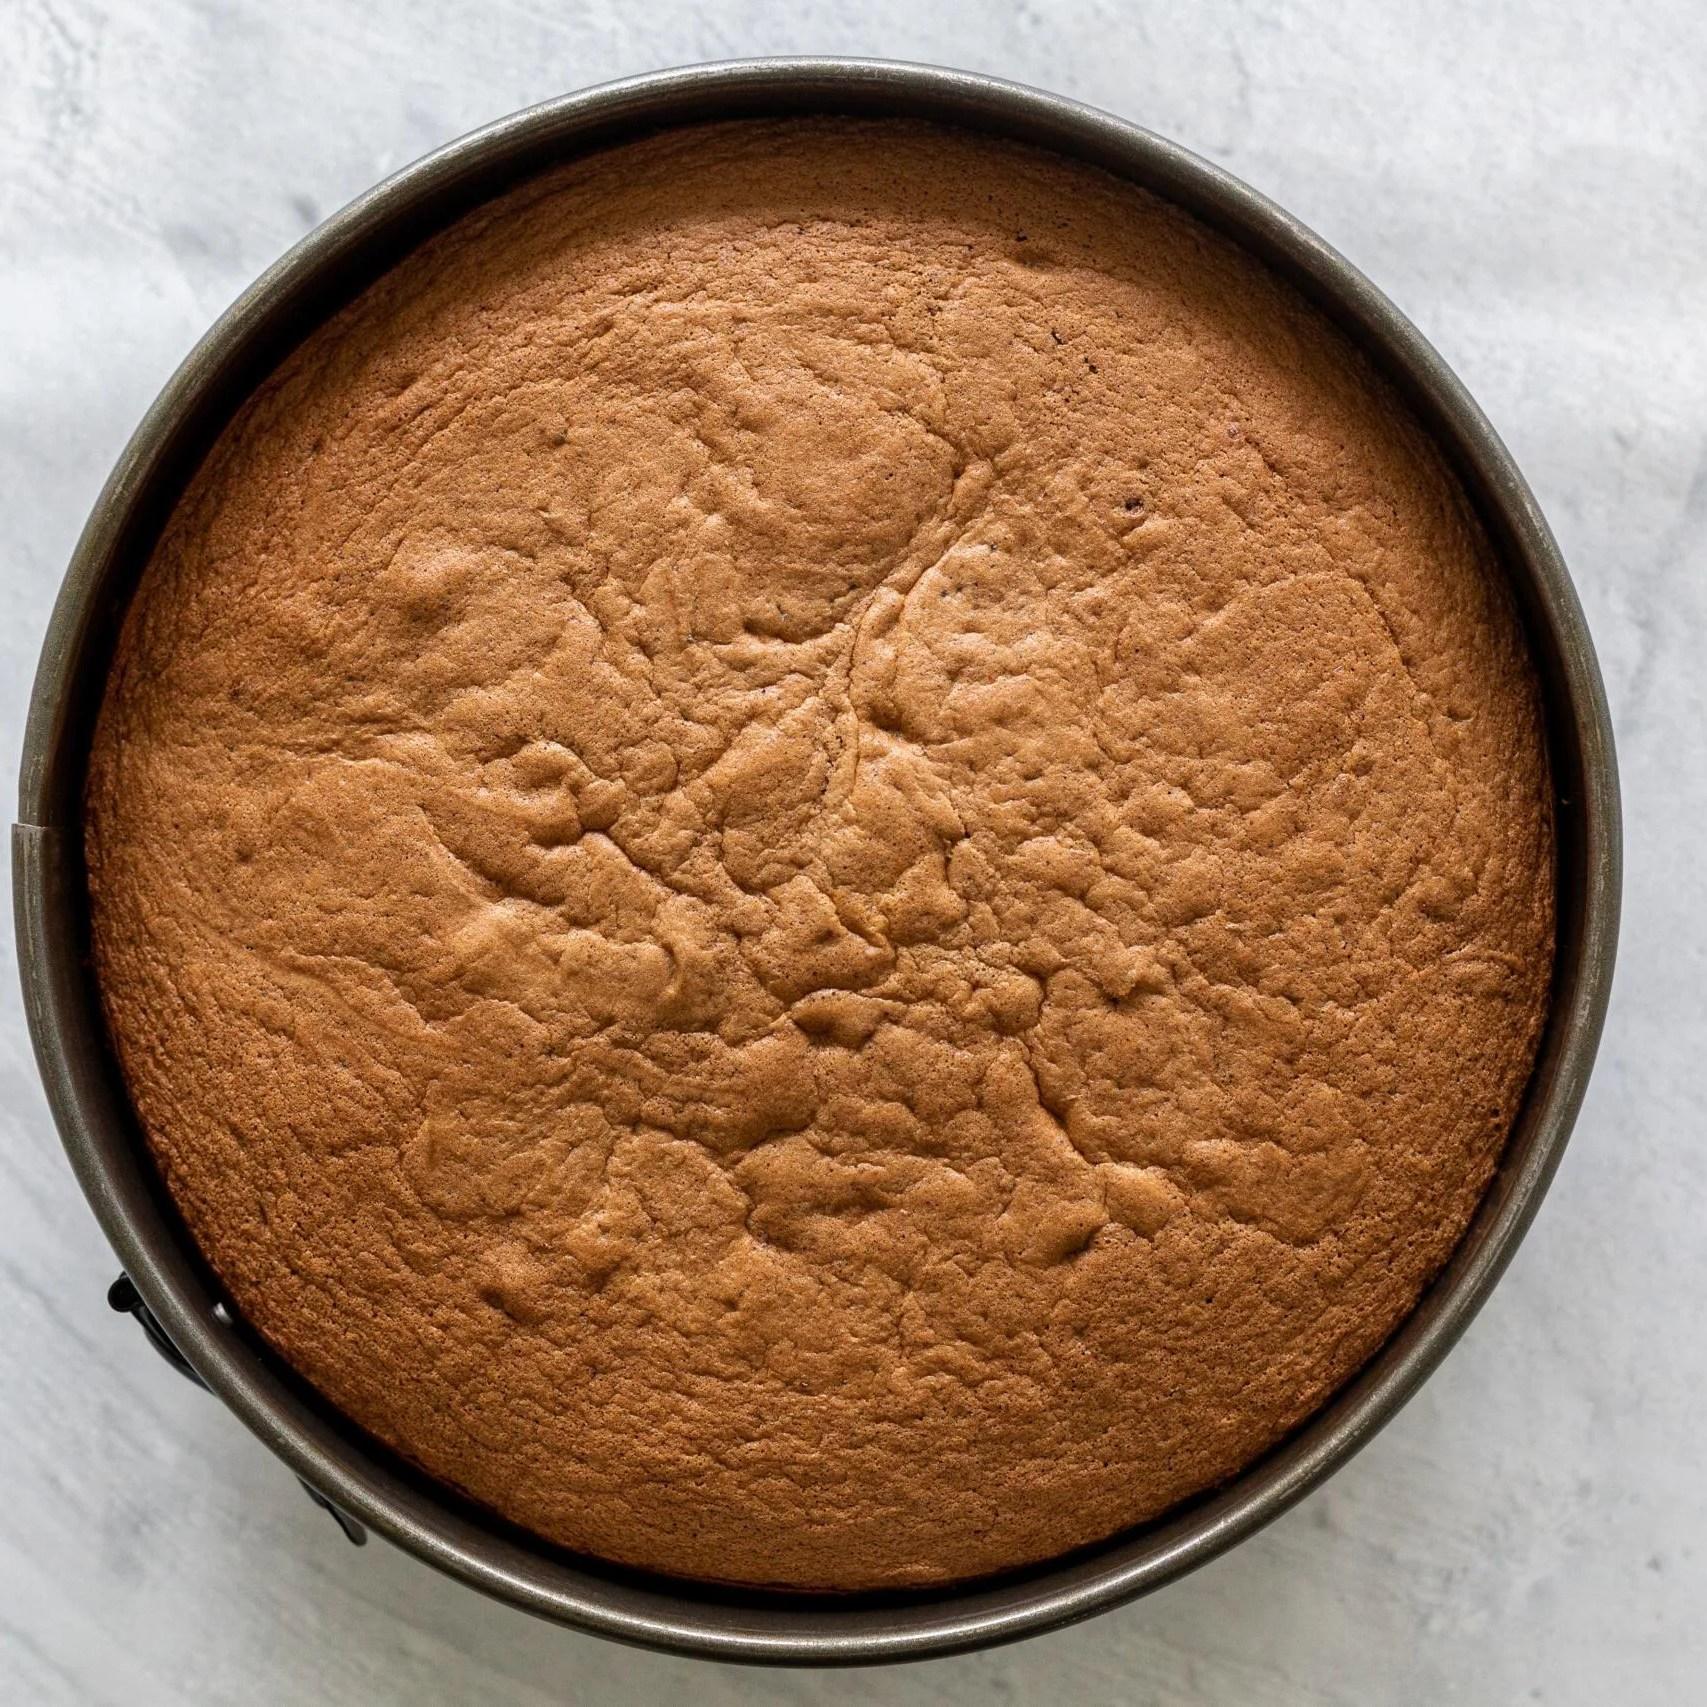 Chocolate sponge cake in a pan